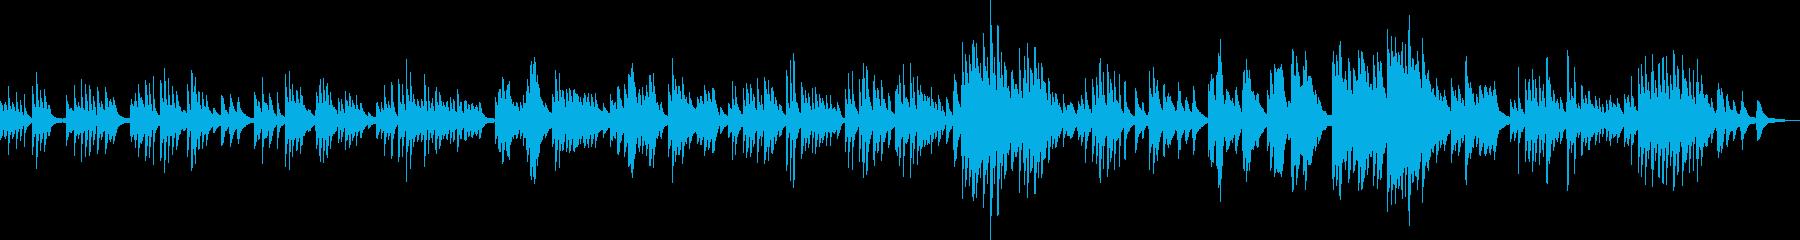 Sad melody piano solo song's reproduced waveform